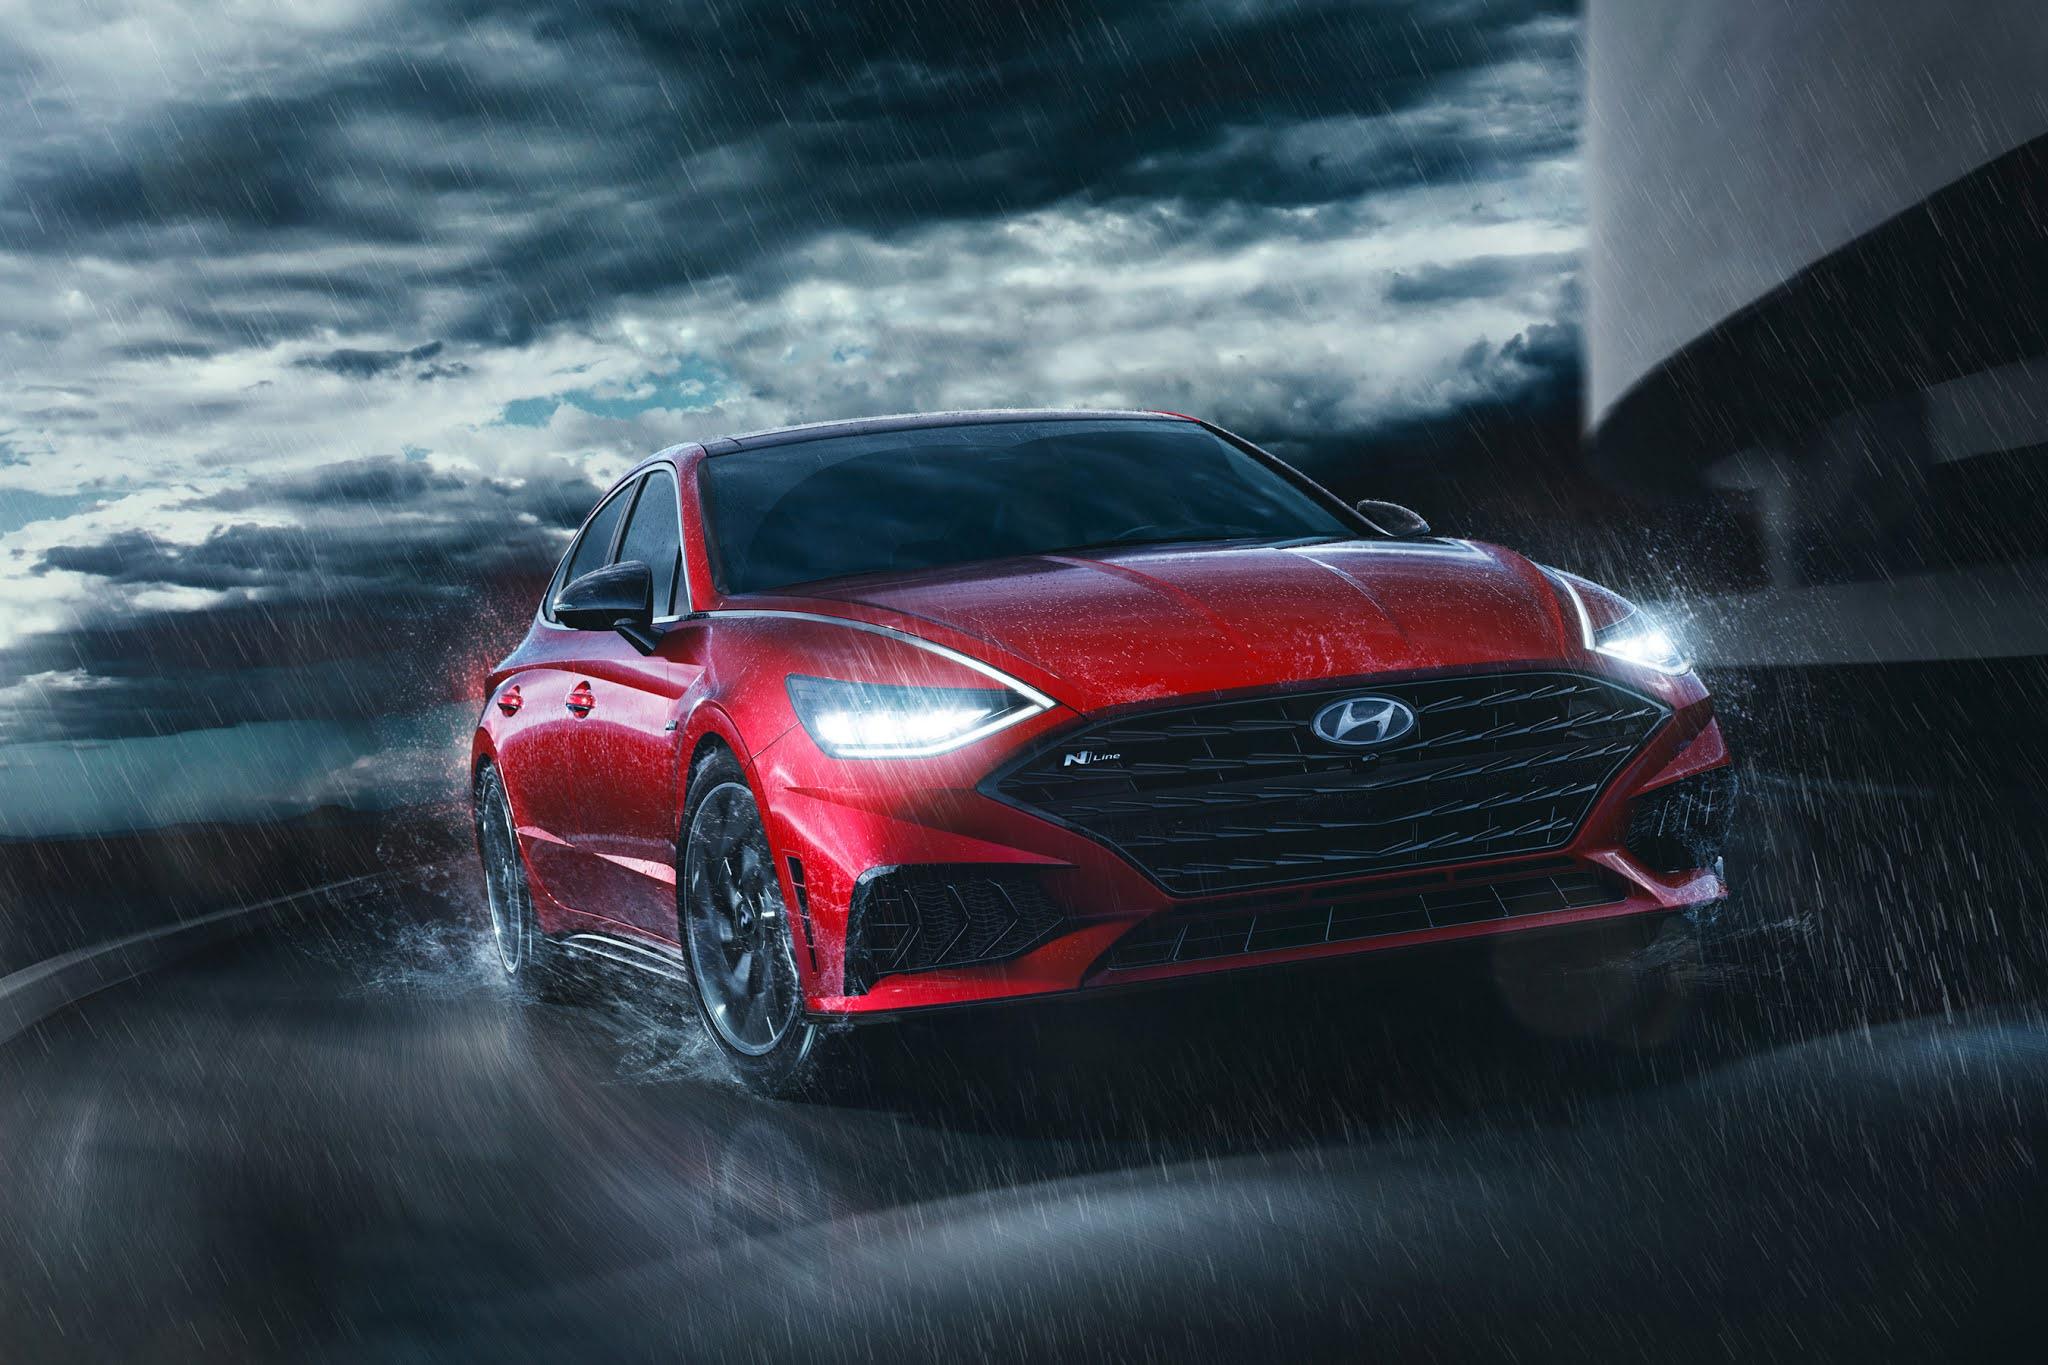 2021 Sonata N Line: Hyundai's Hot New Sedan Gets a High-Performance Look